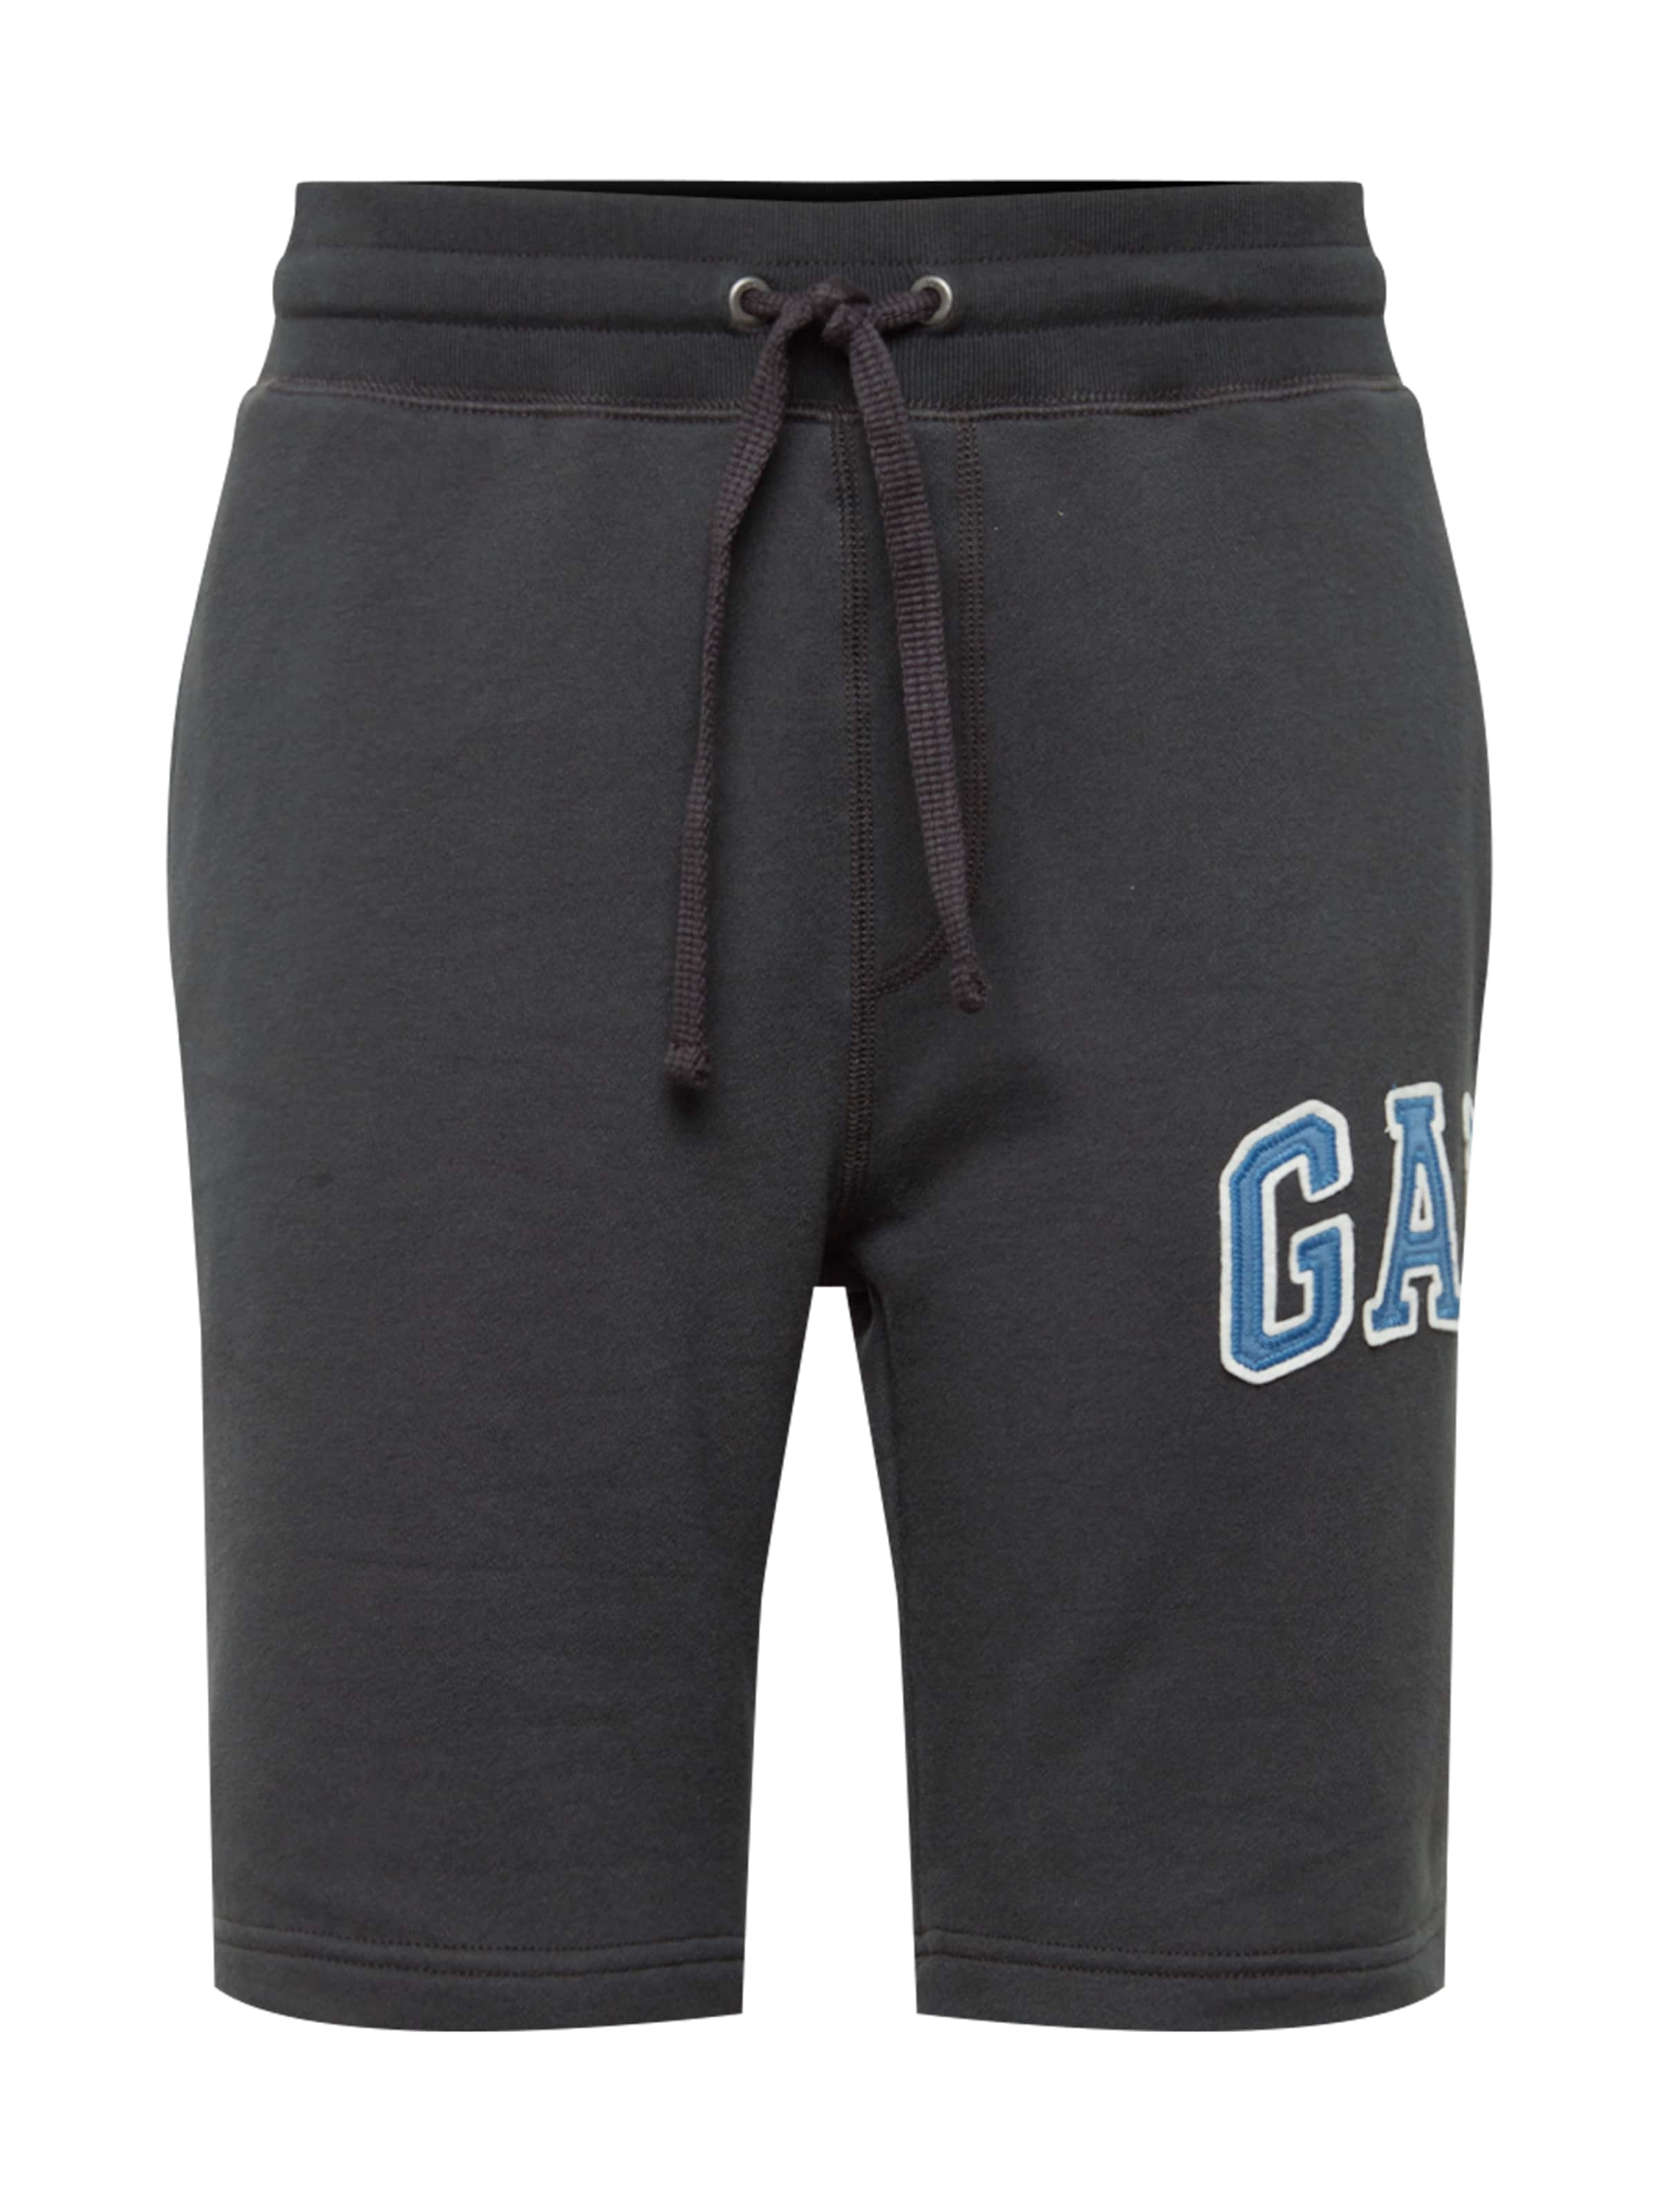 In HellblauDunkelblau In Gap In In Gap Shorts Shorts Shorts Shorts Gap Gap HellblauDunkelblau HellblauDunkelblau MVSzUp